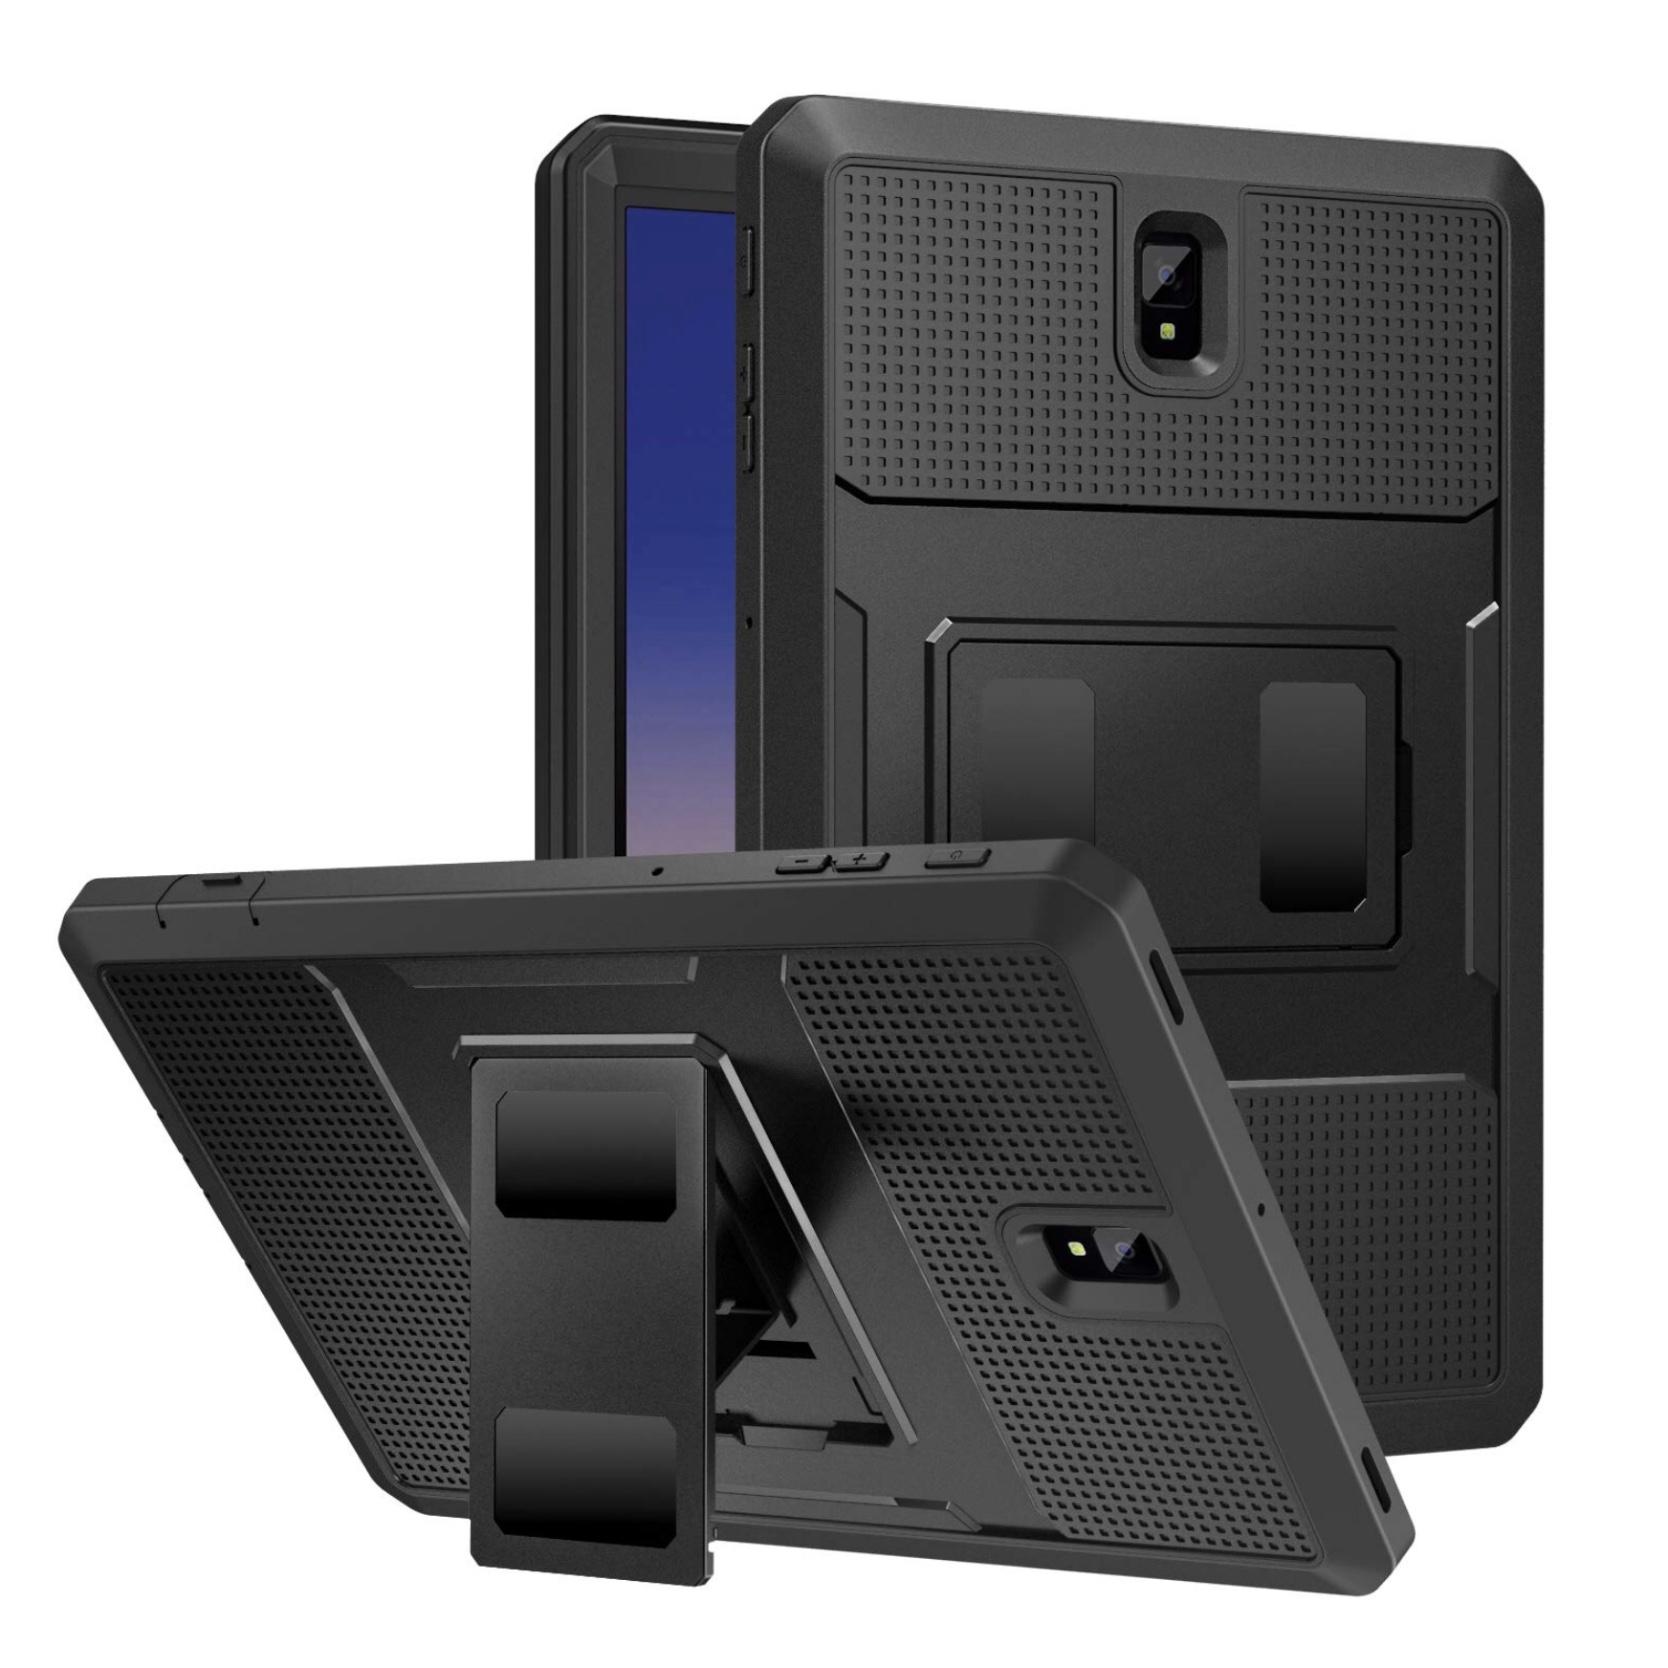 Galaxy TAB S4 10.5 pouces Coque de protection Pied et film rigide ecran Pro Tab Noir